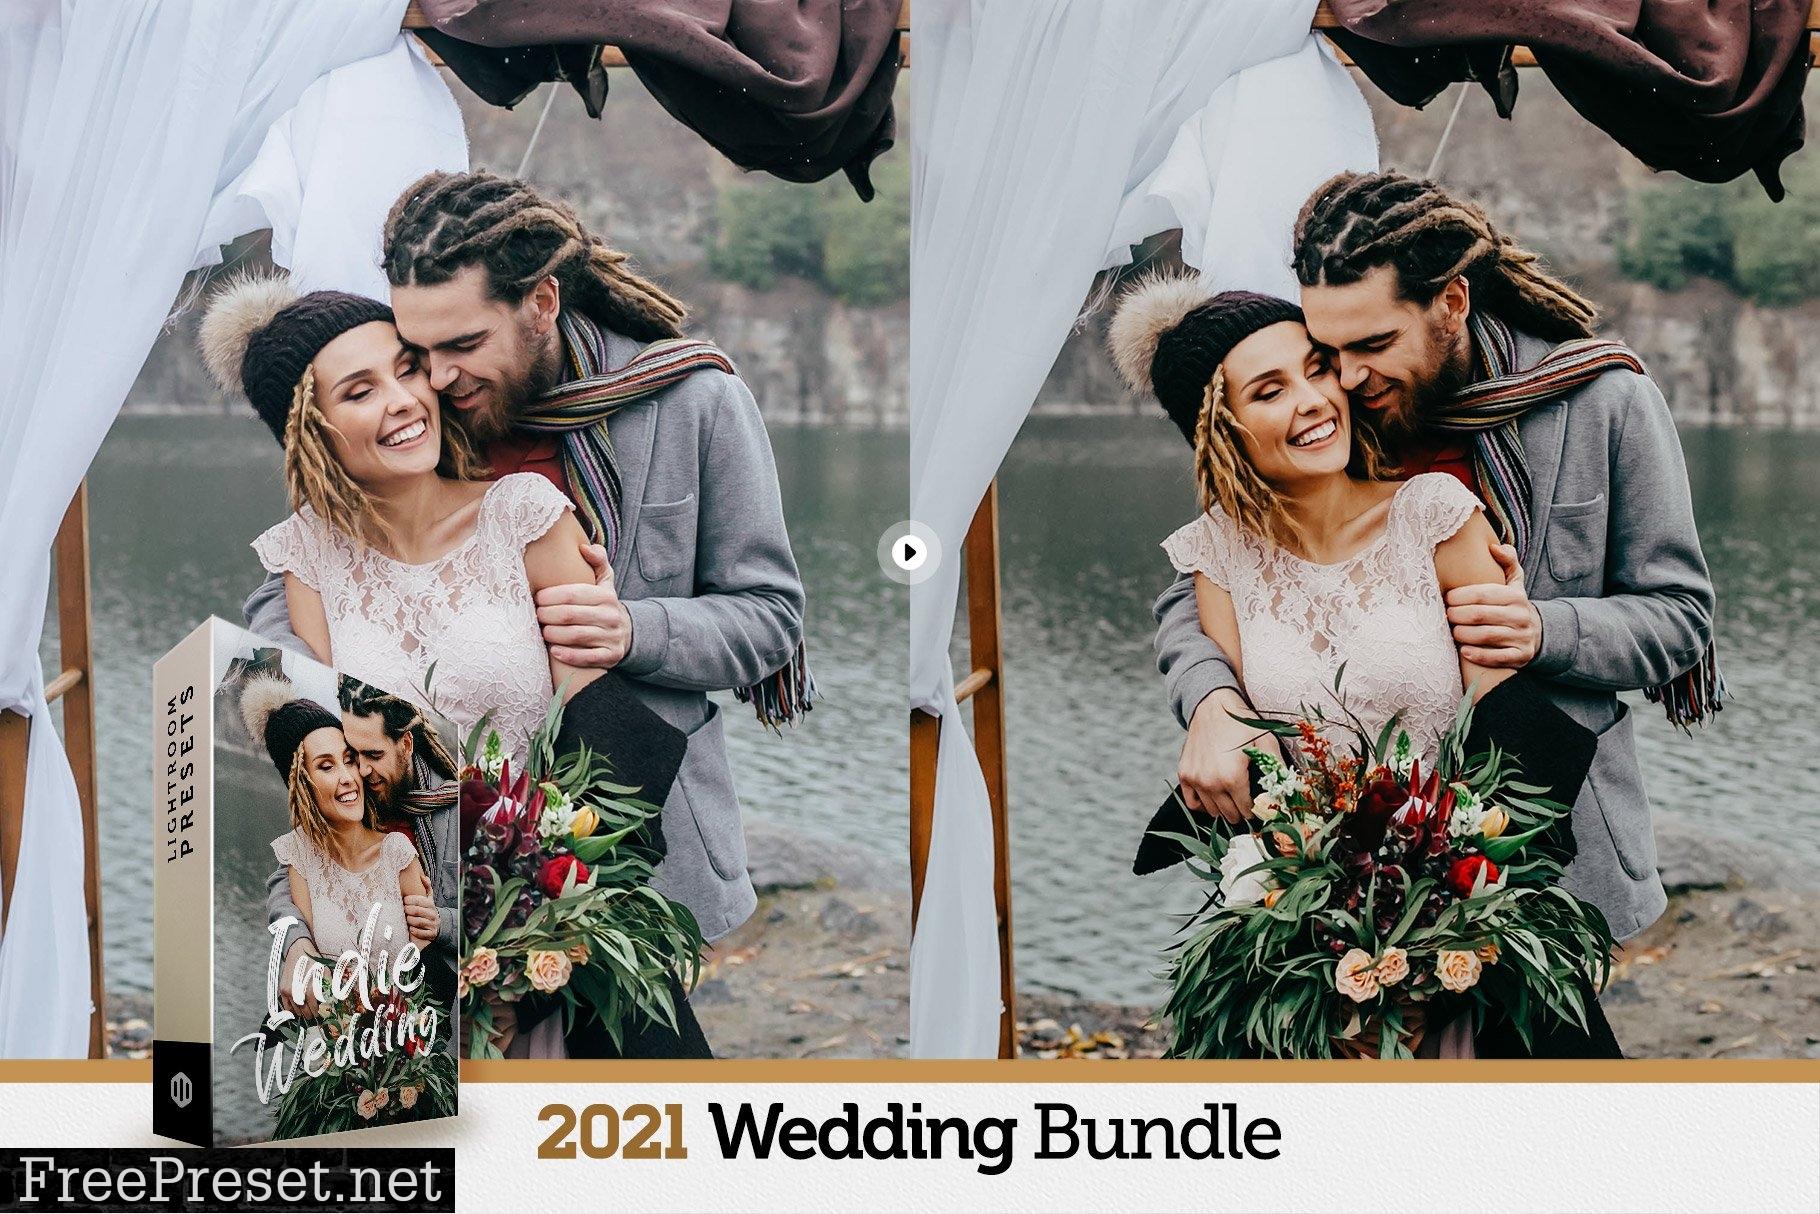 200+ Wedding Presets Bundle 2021 6172458